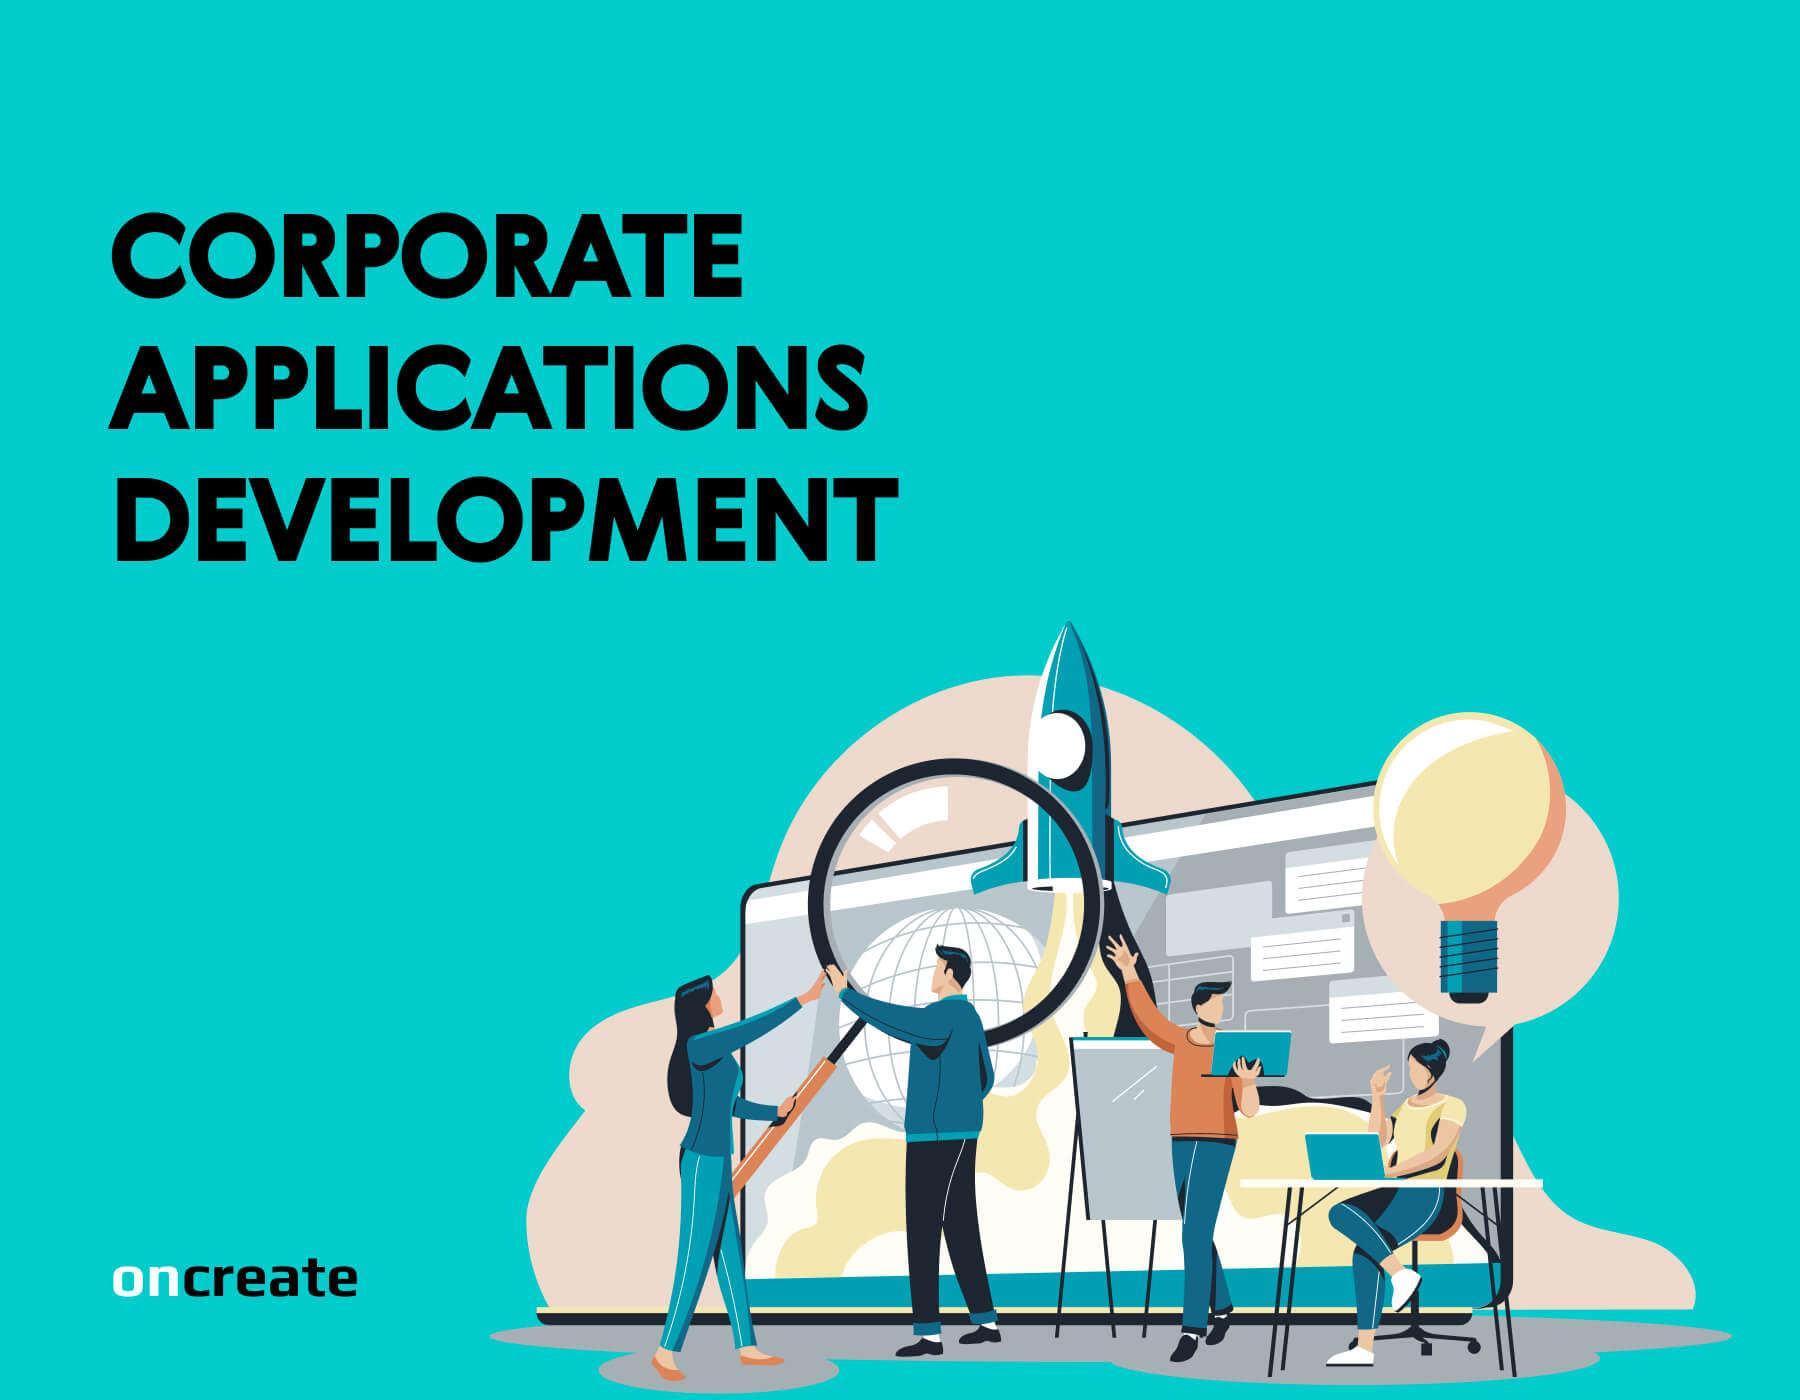 Corporate Applications Development